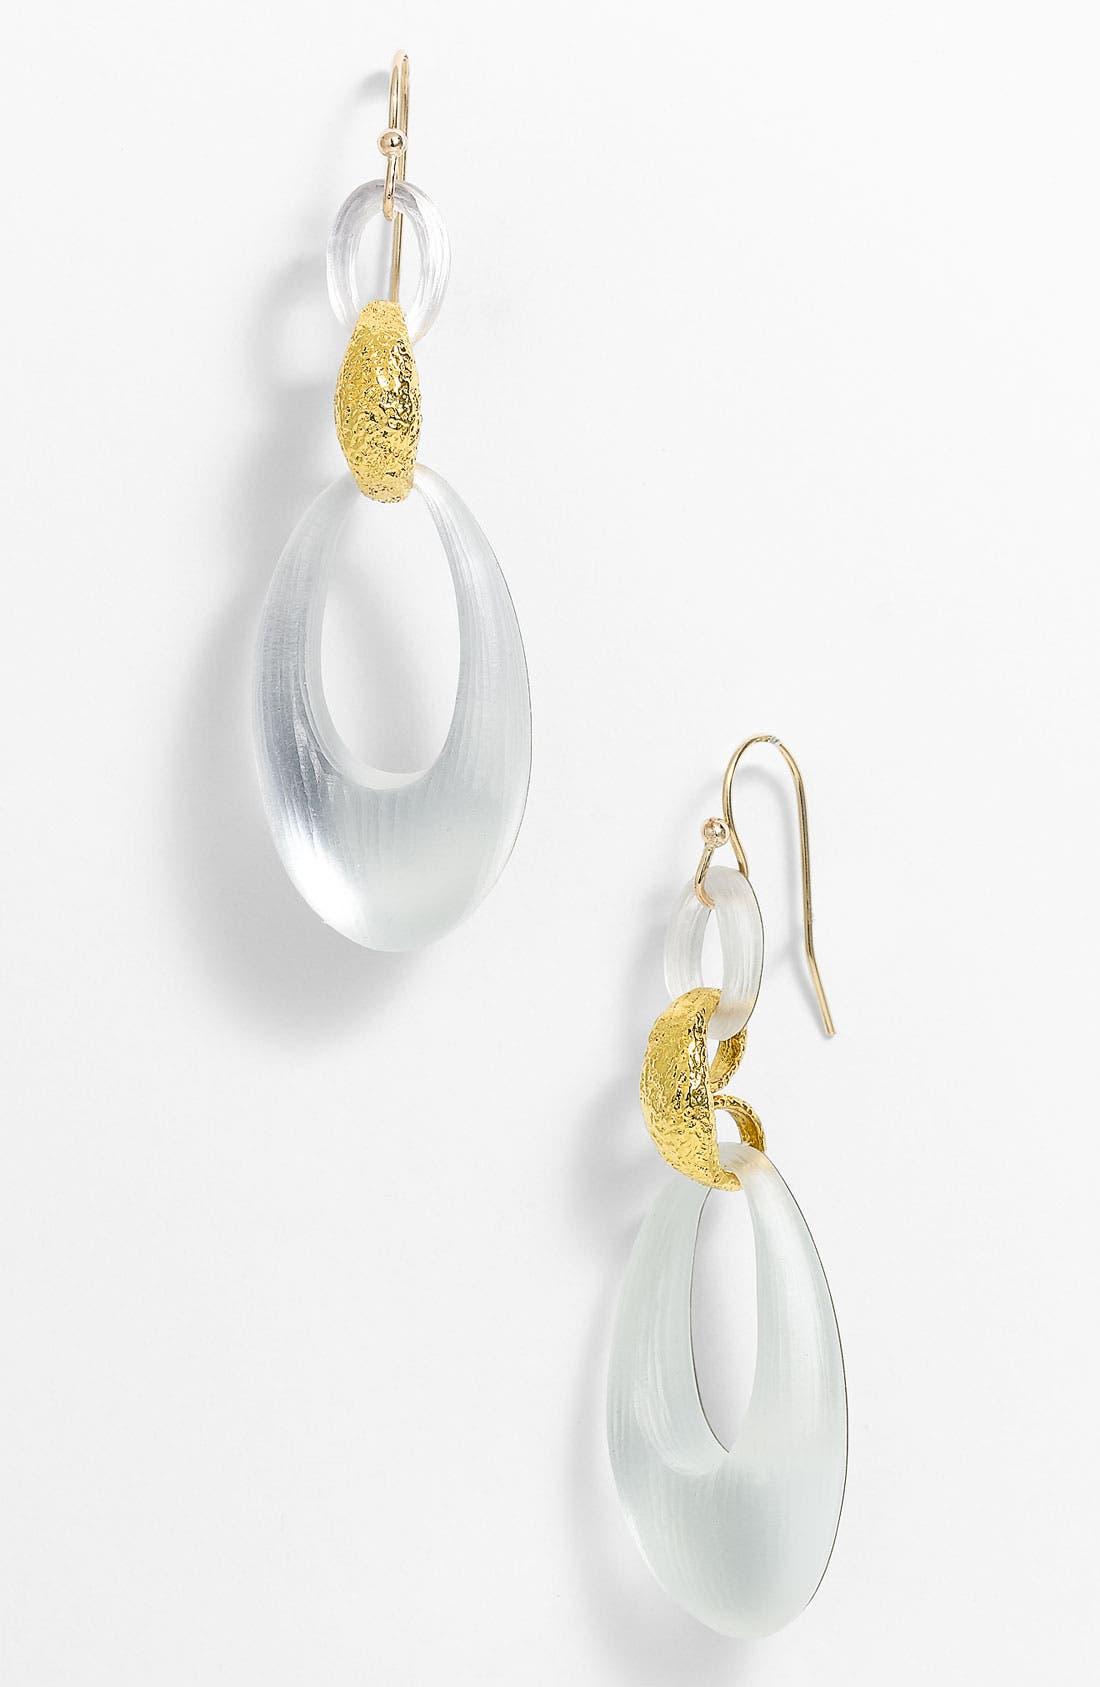 Main Image - Alexis Bittar Double Link Earrings